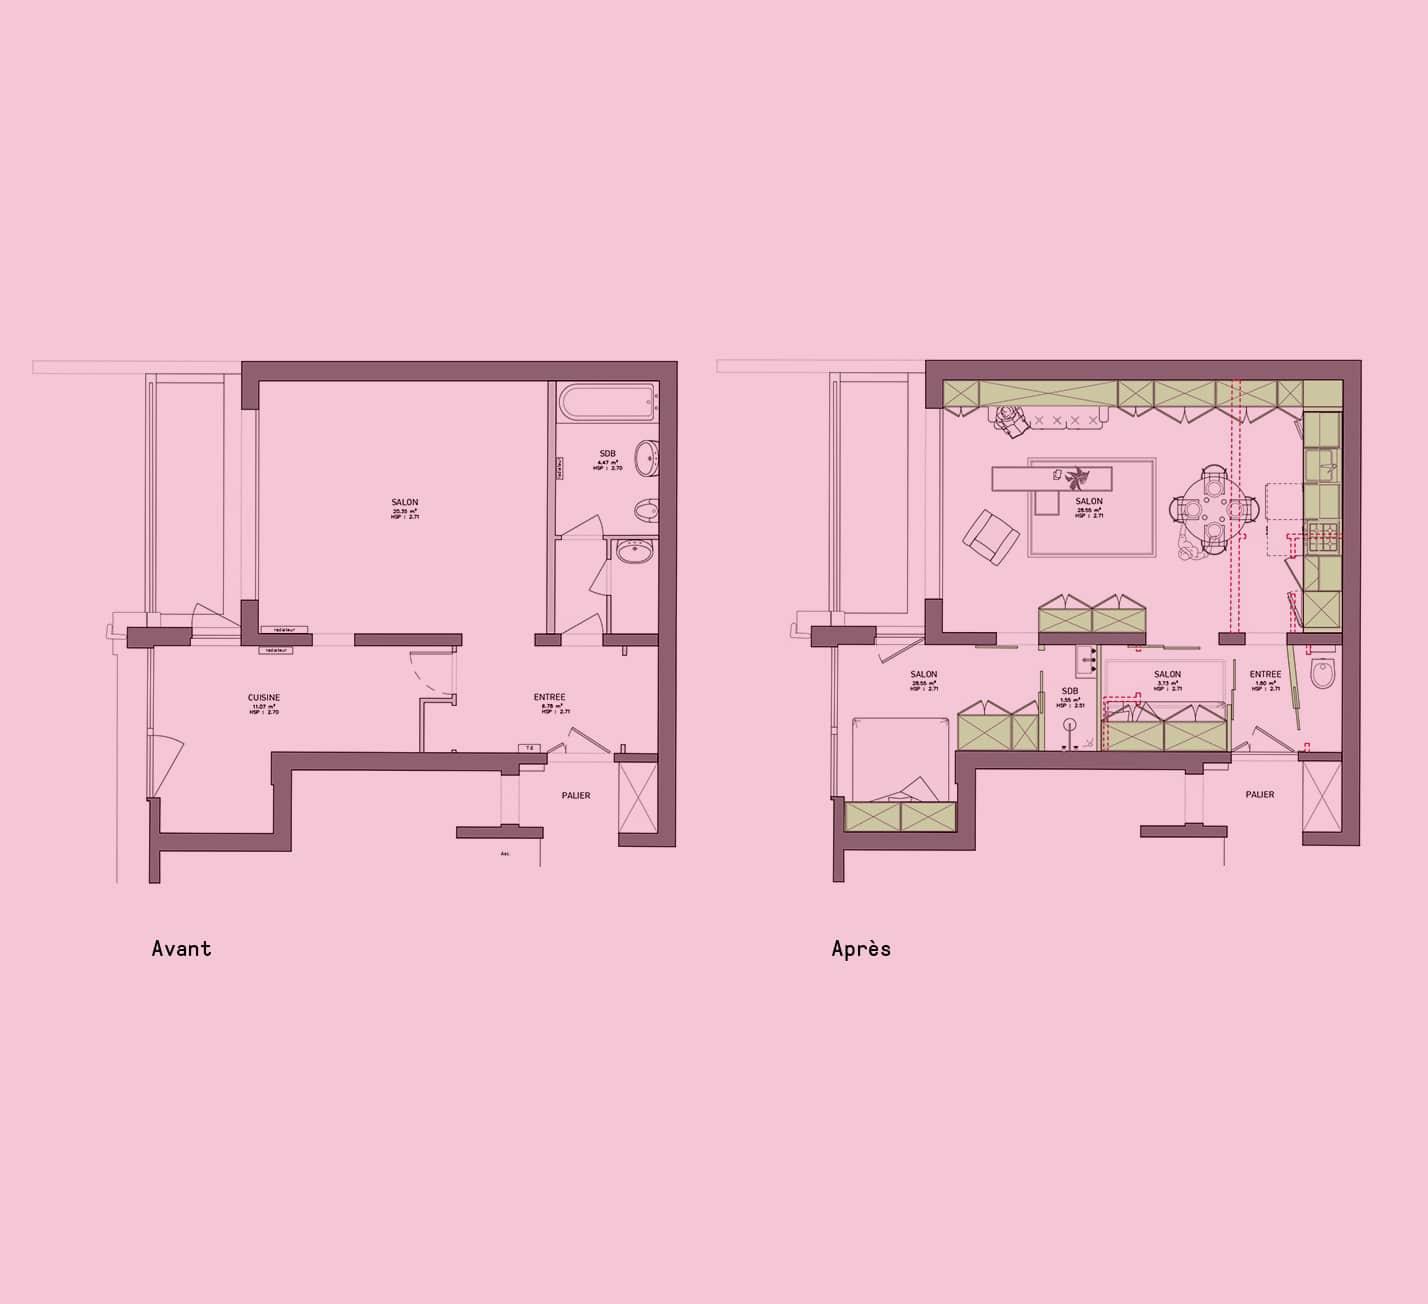 Projet-Albert-Atelier-Steve-Pauline-Borgia-Architecte-Plan-02-min-1